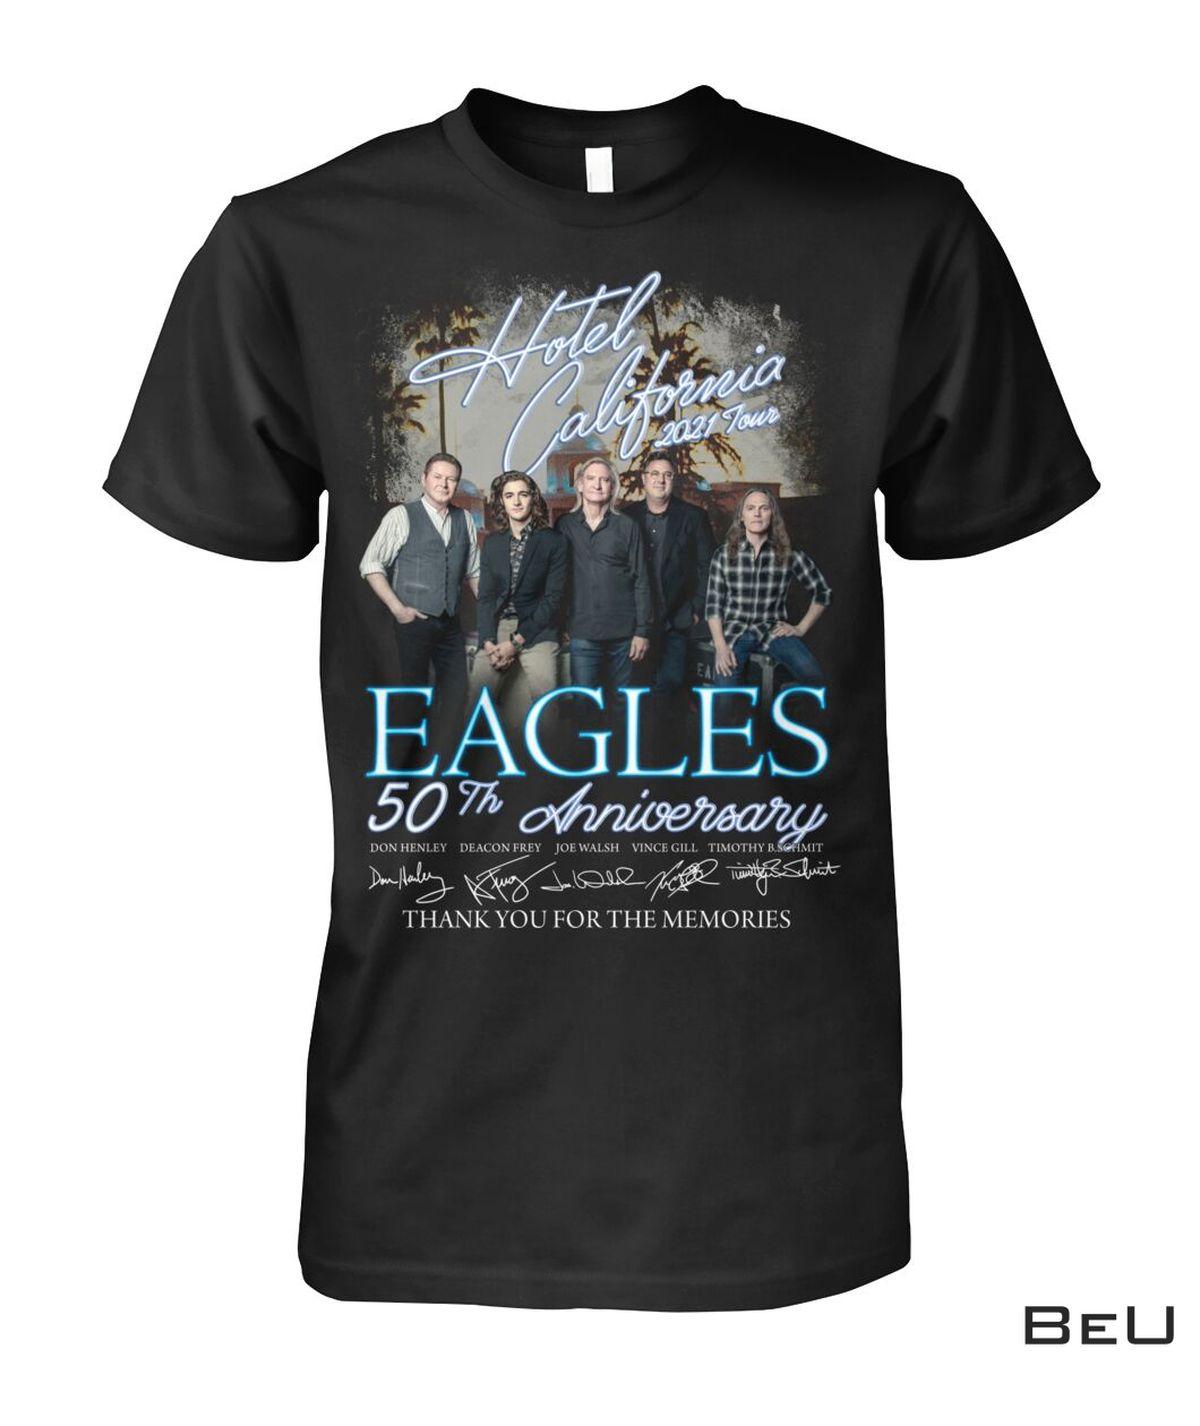 Hotel California 2021 Tour Eagles 50th Anniversary Shirt, hoodie, tank top